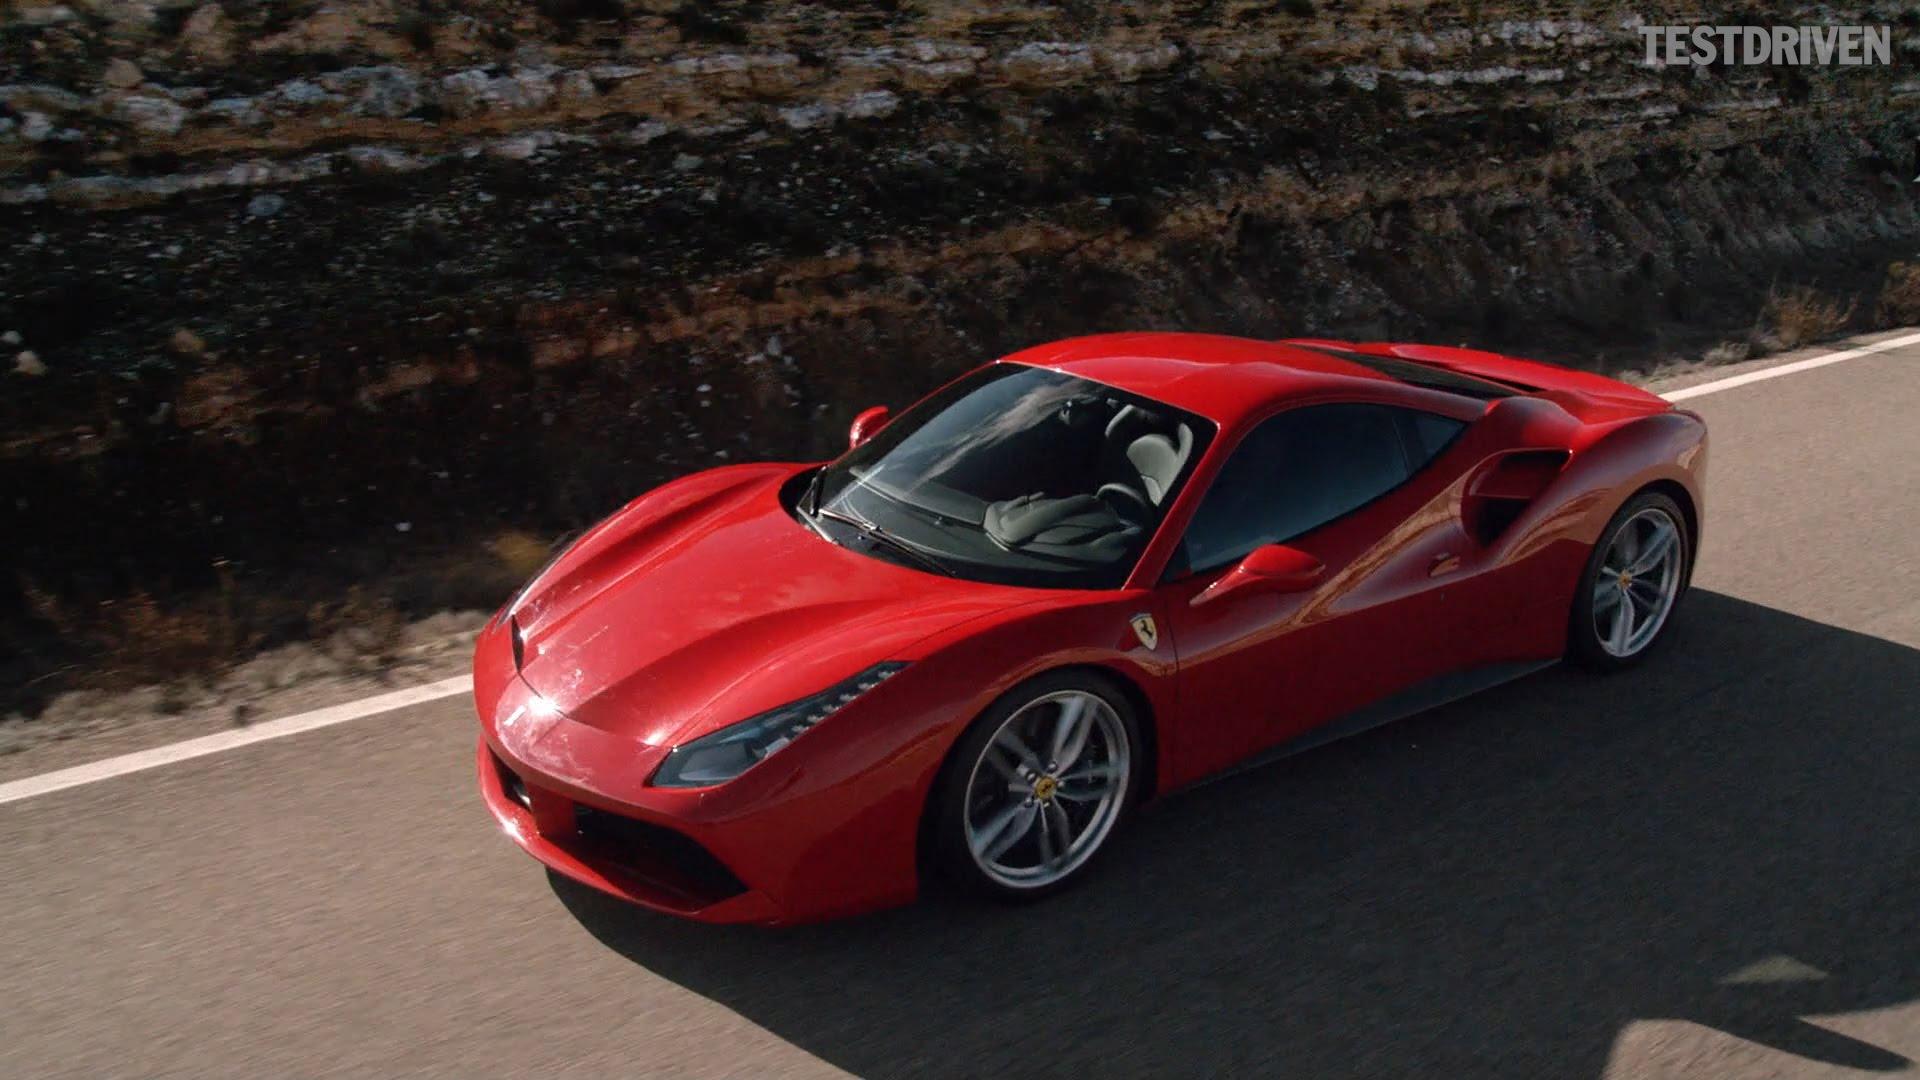 a closer look at the new ferrari 488 gtb (video) | horsepowerkings